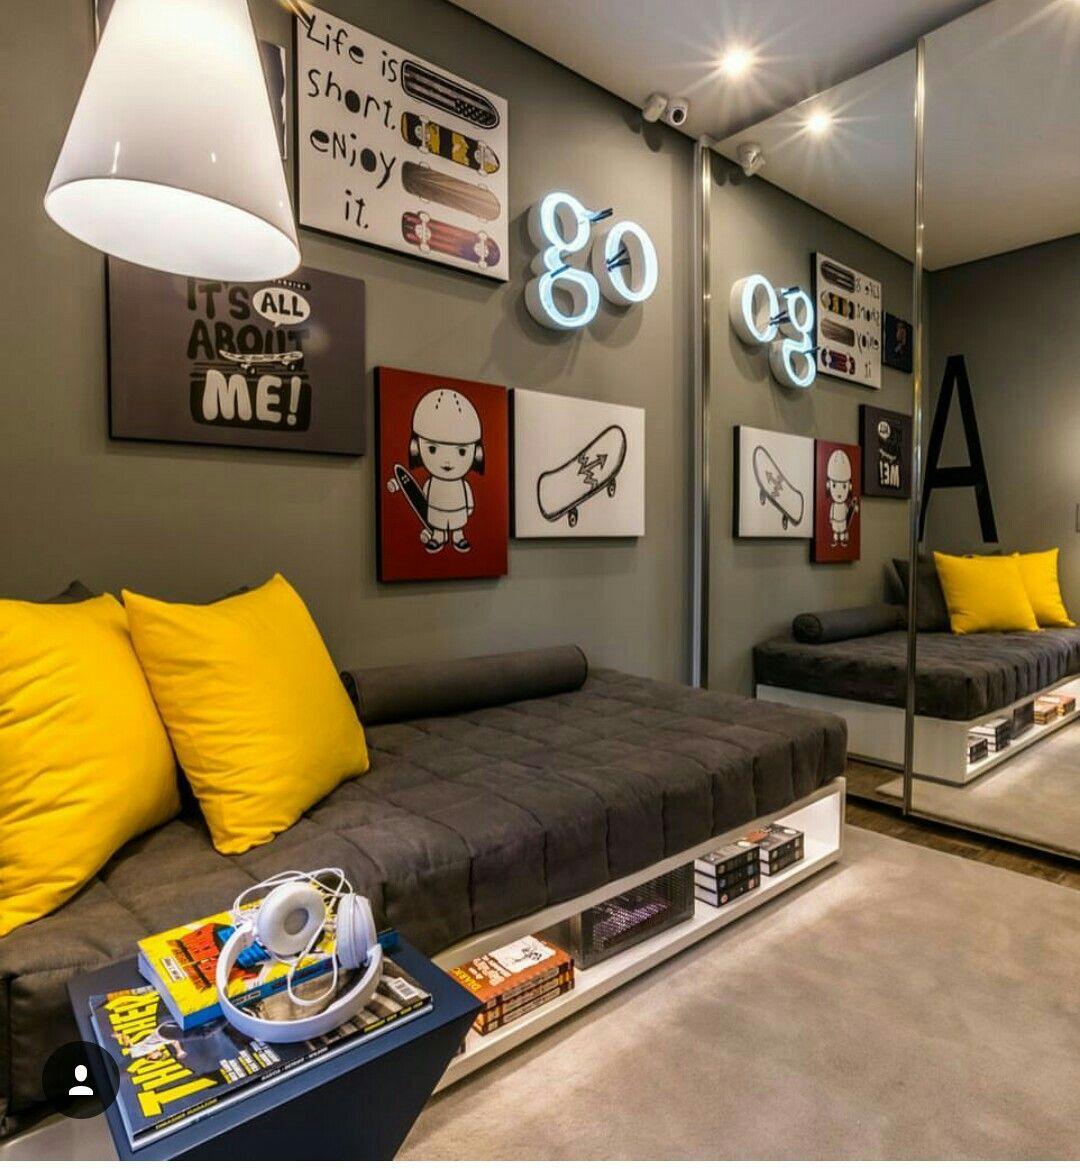 Bedroom Sets Tumblr Interior House Design Bedroom Bedroom Sets Children Bedroom Sets Black Friday: Habitaciones Juveniles